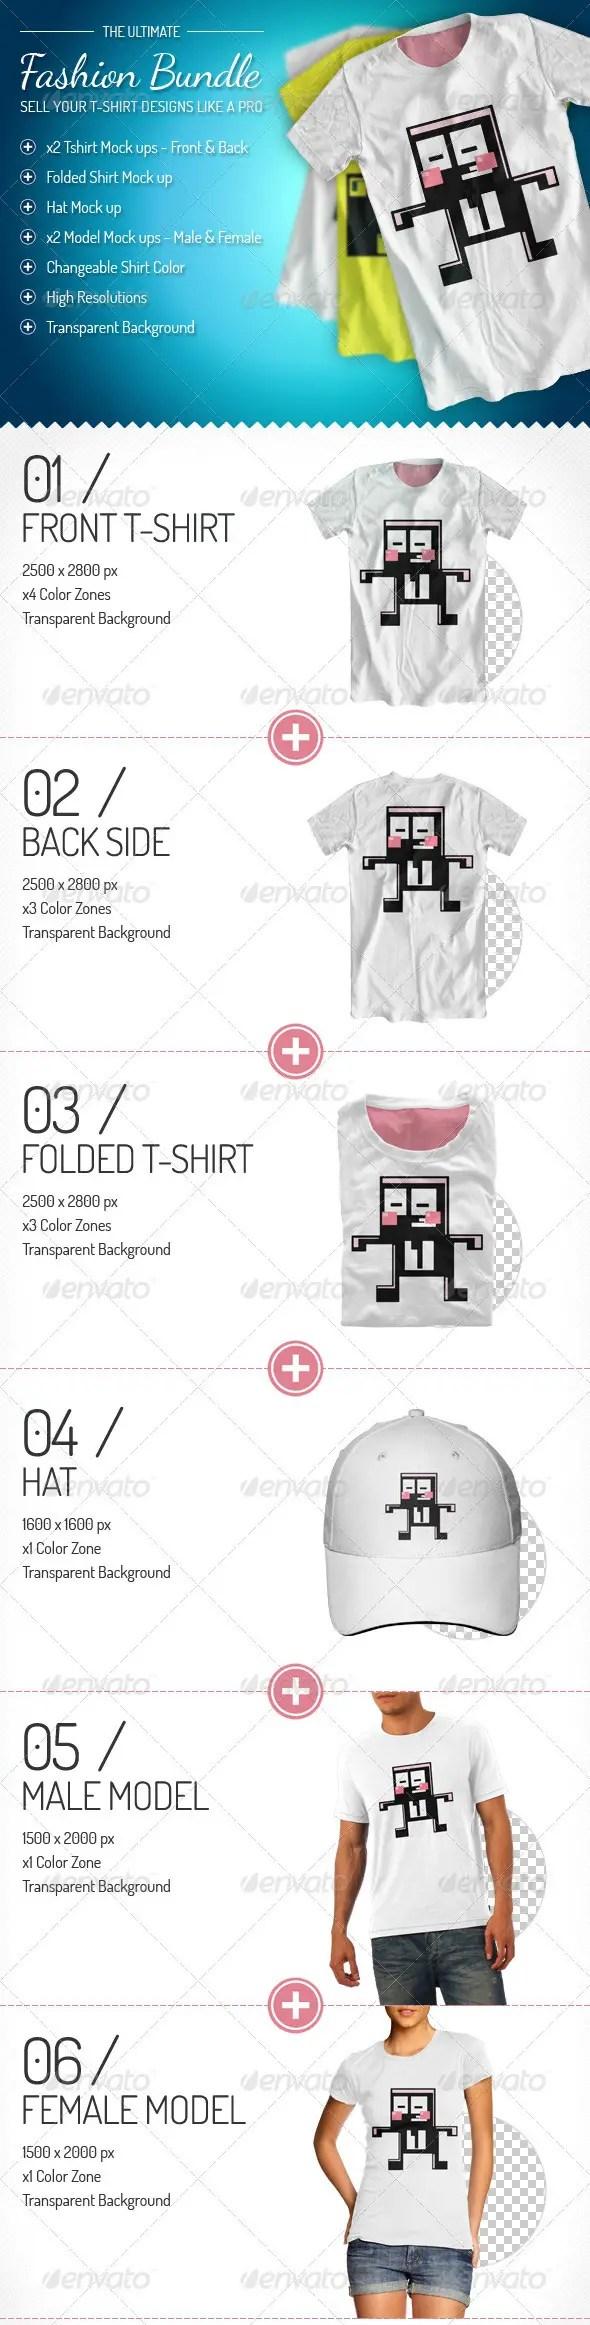 Fashion Bundle - x3 T-shirt / x2 Models / Hat